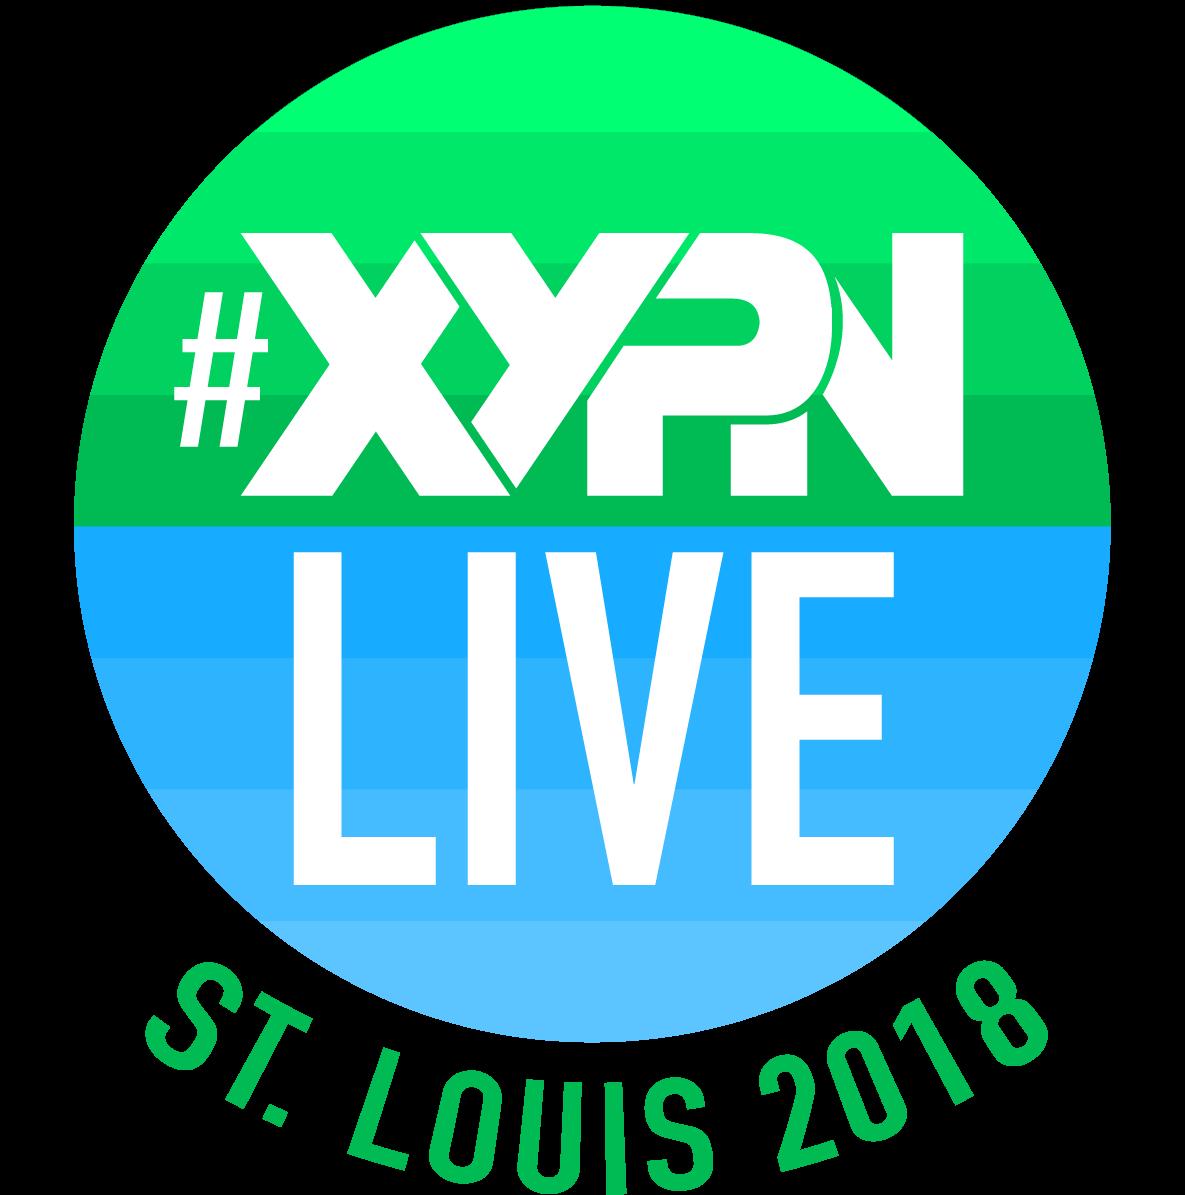 xypn_LIVE-transparent.png